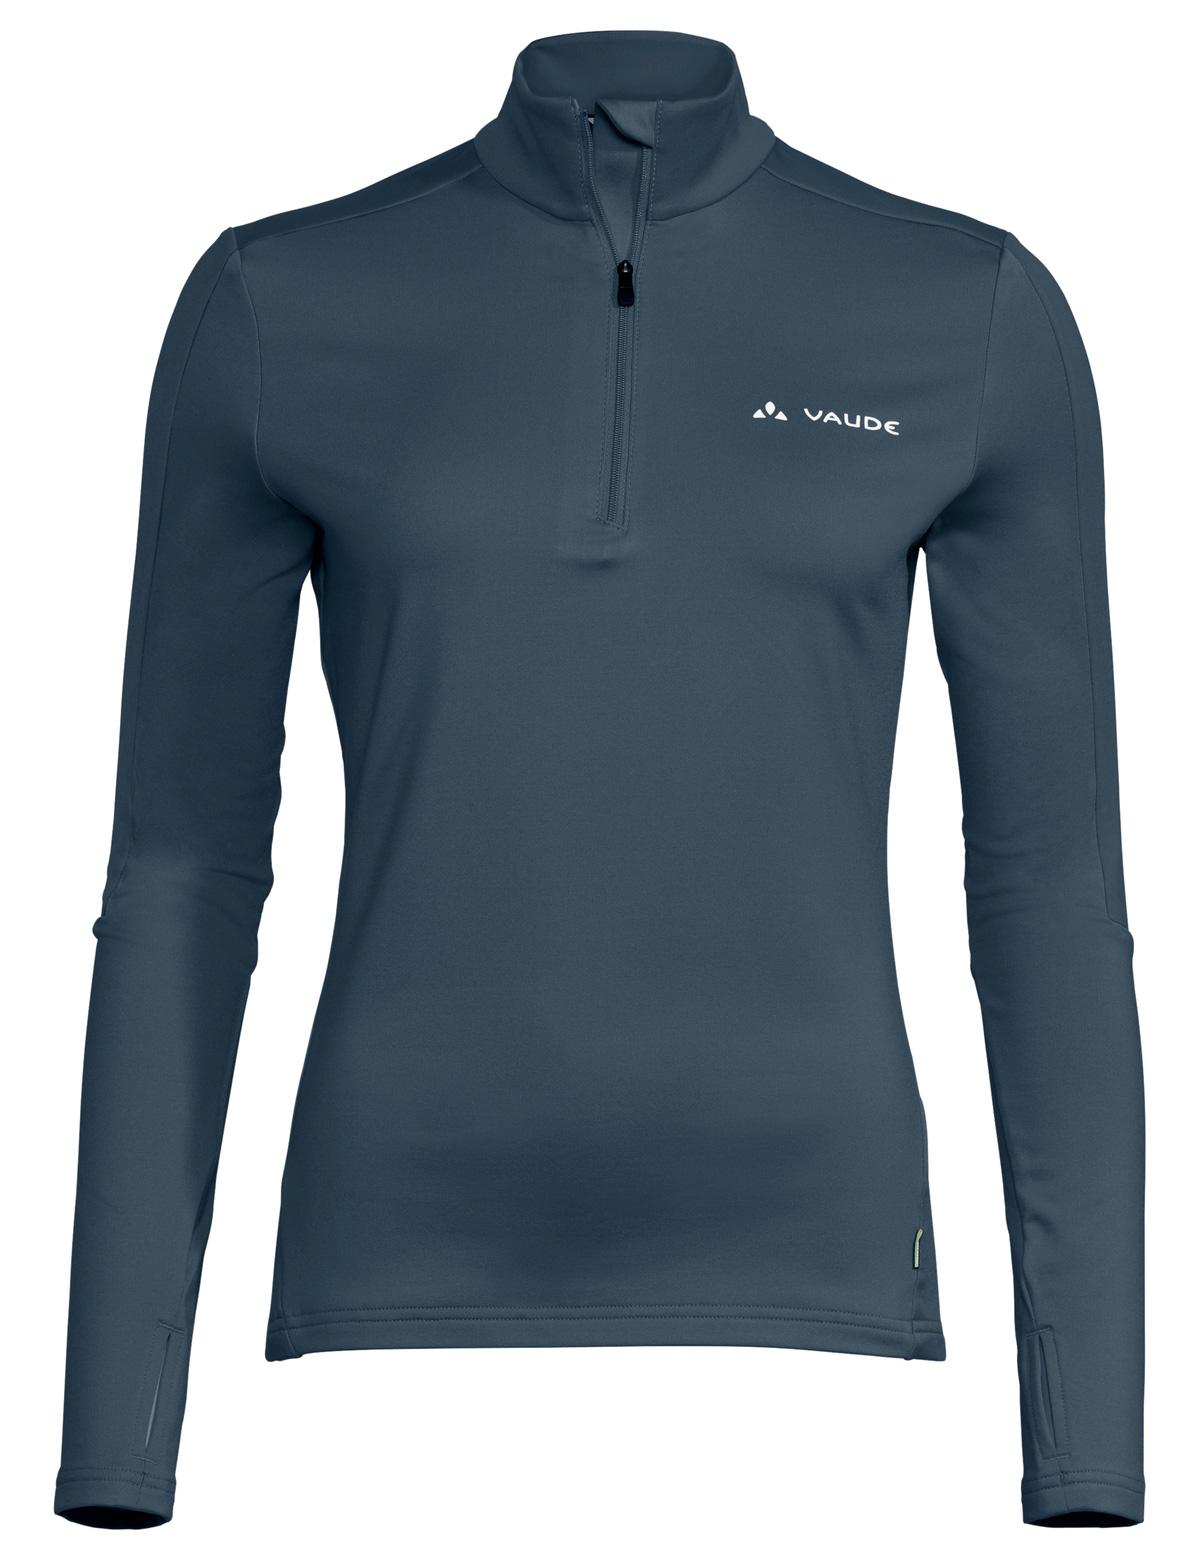 Vaude Livigno Halfzip II Damen Shirt - steelblue